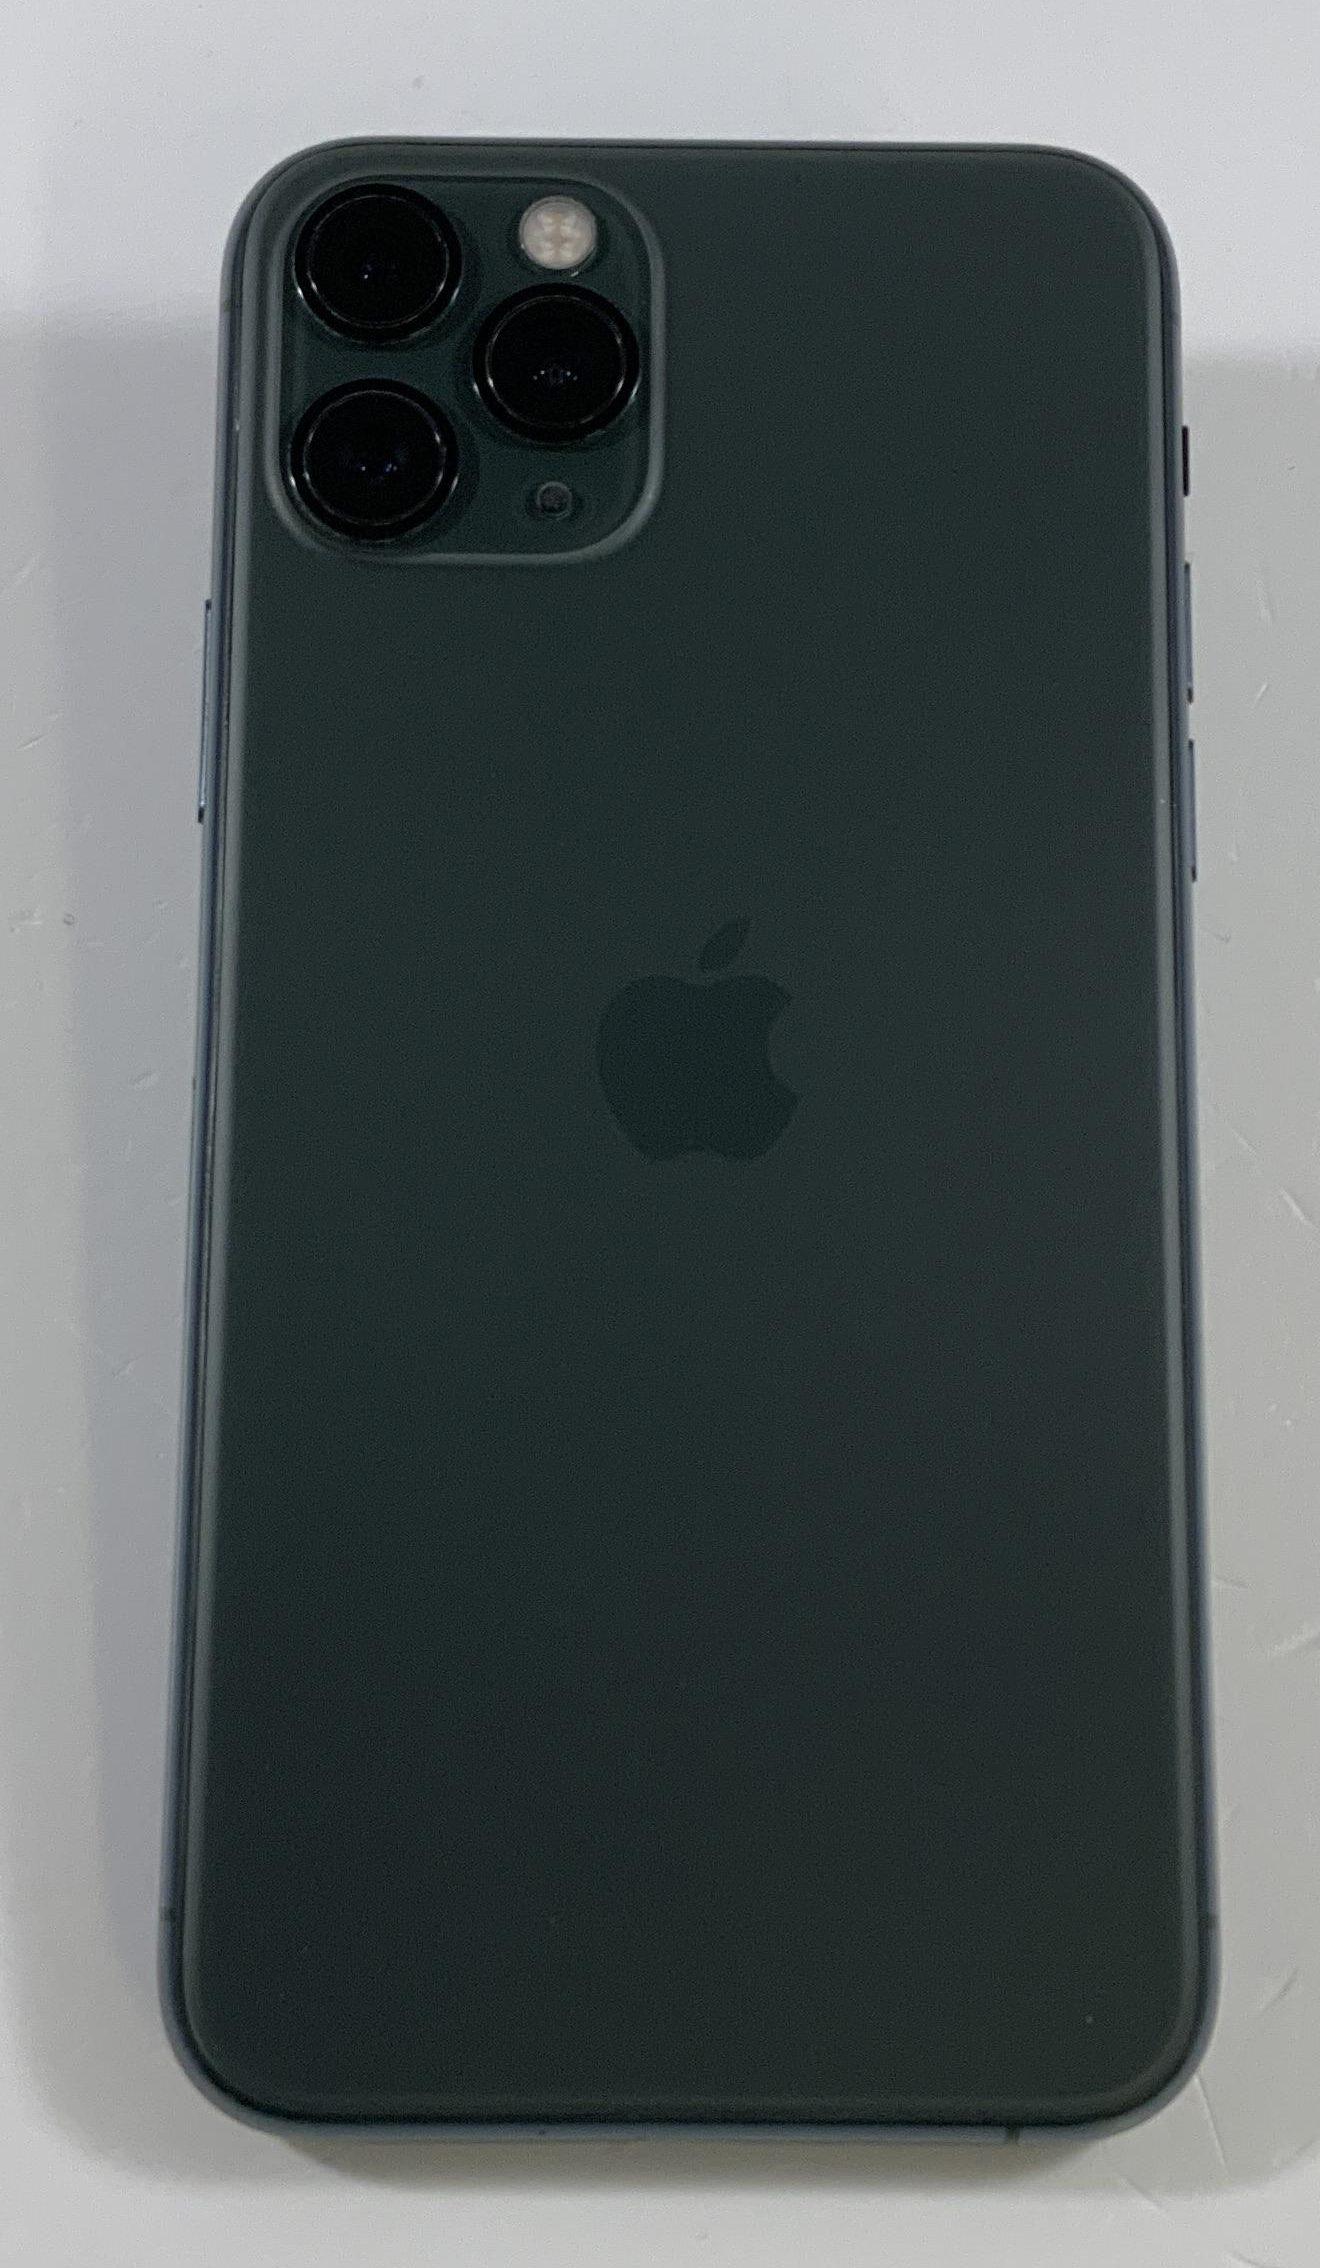 iPhone 11 Pro 256GB, 256GB, Midnight Green, image 2